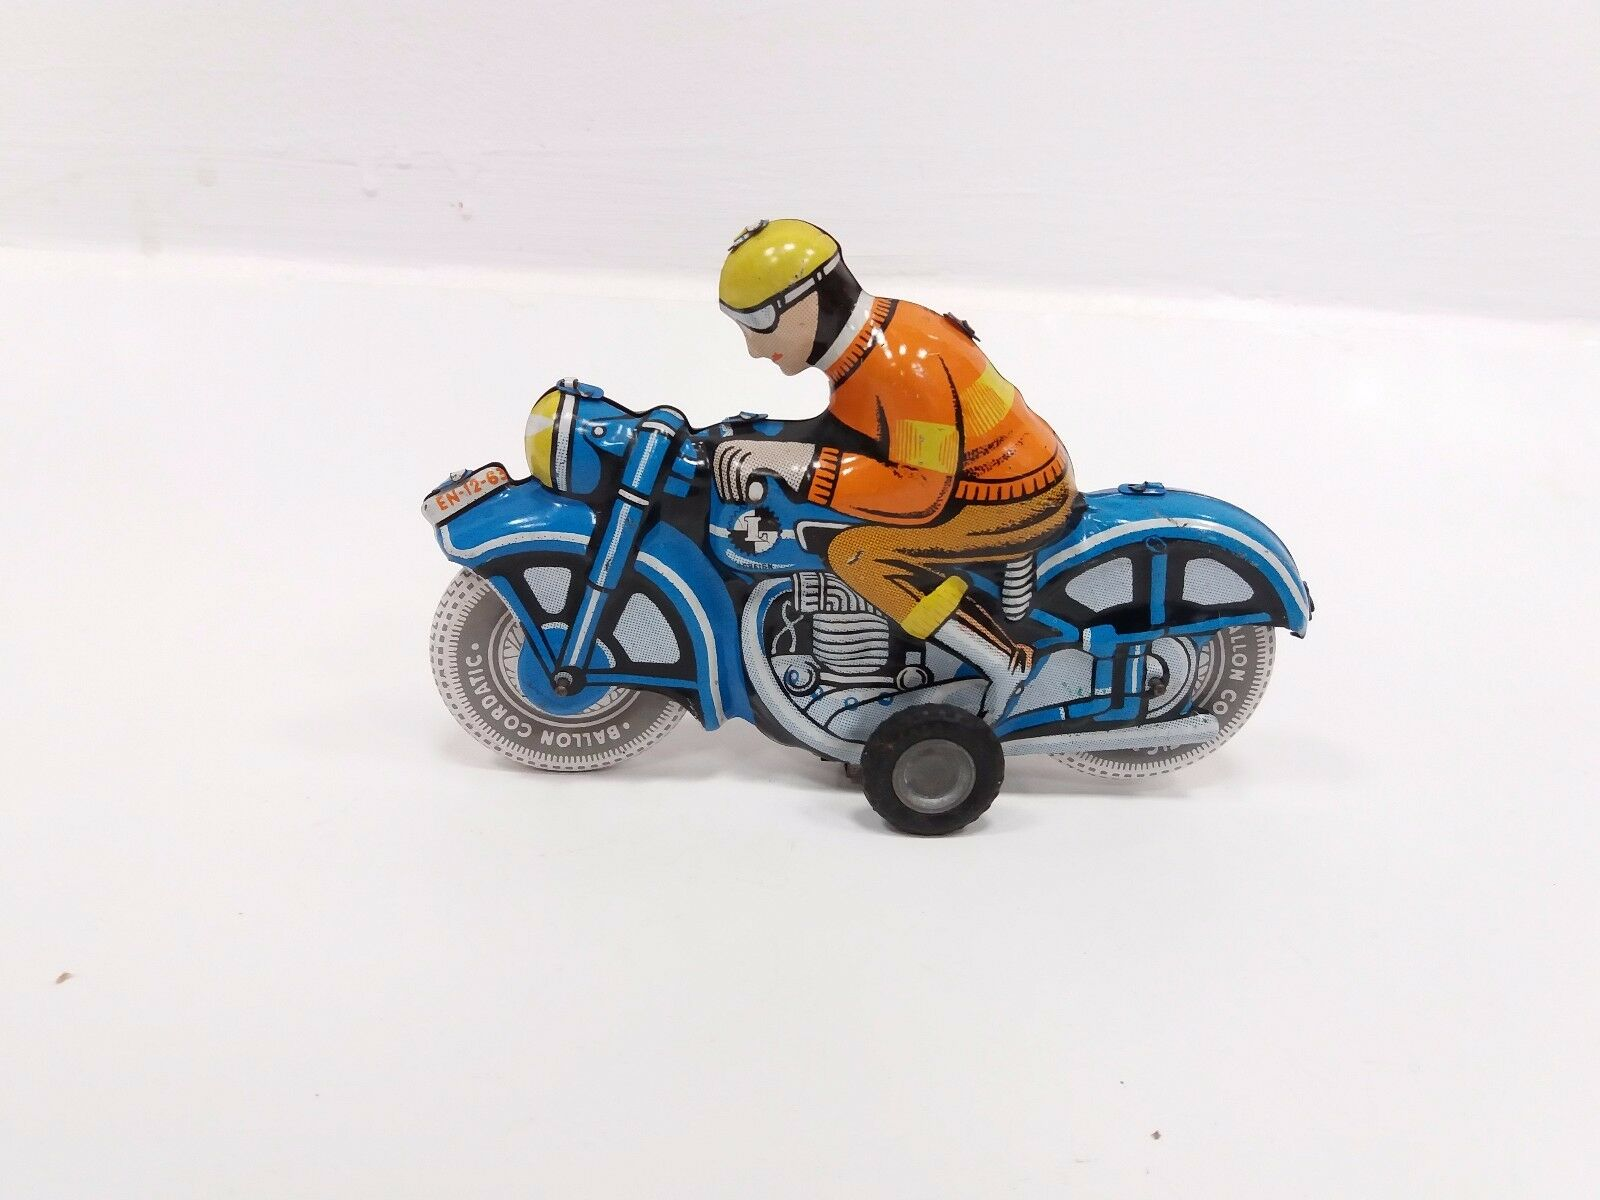 VINTAGE RARE OLD LEMEZARY GYAR SPORTS TIN TOY MOTOR MOTORCYCLIST 1960's FRICTION